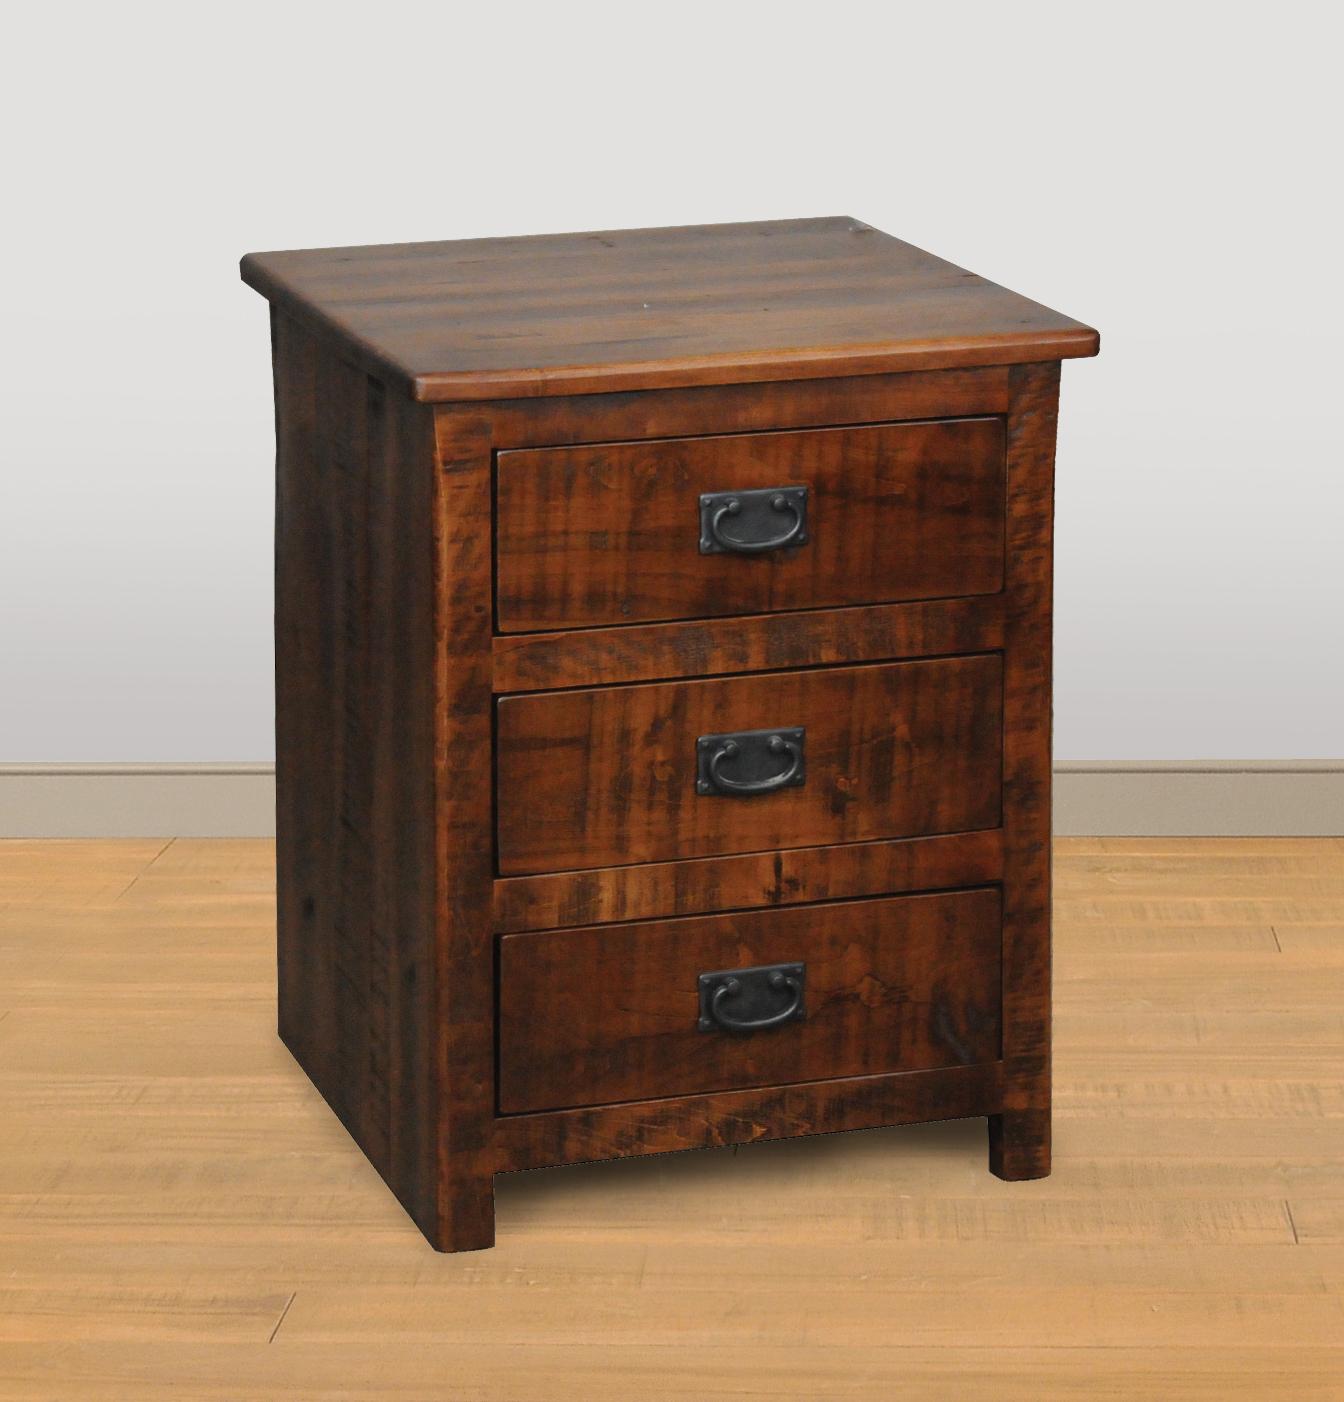 Quality amish furniture